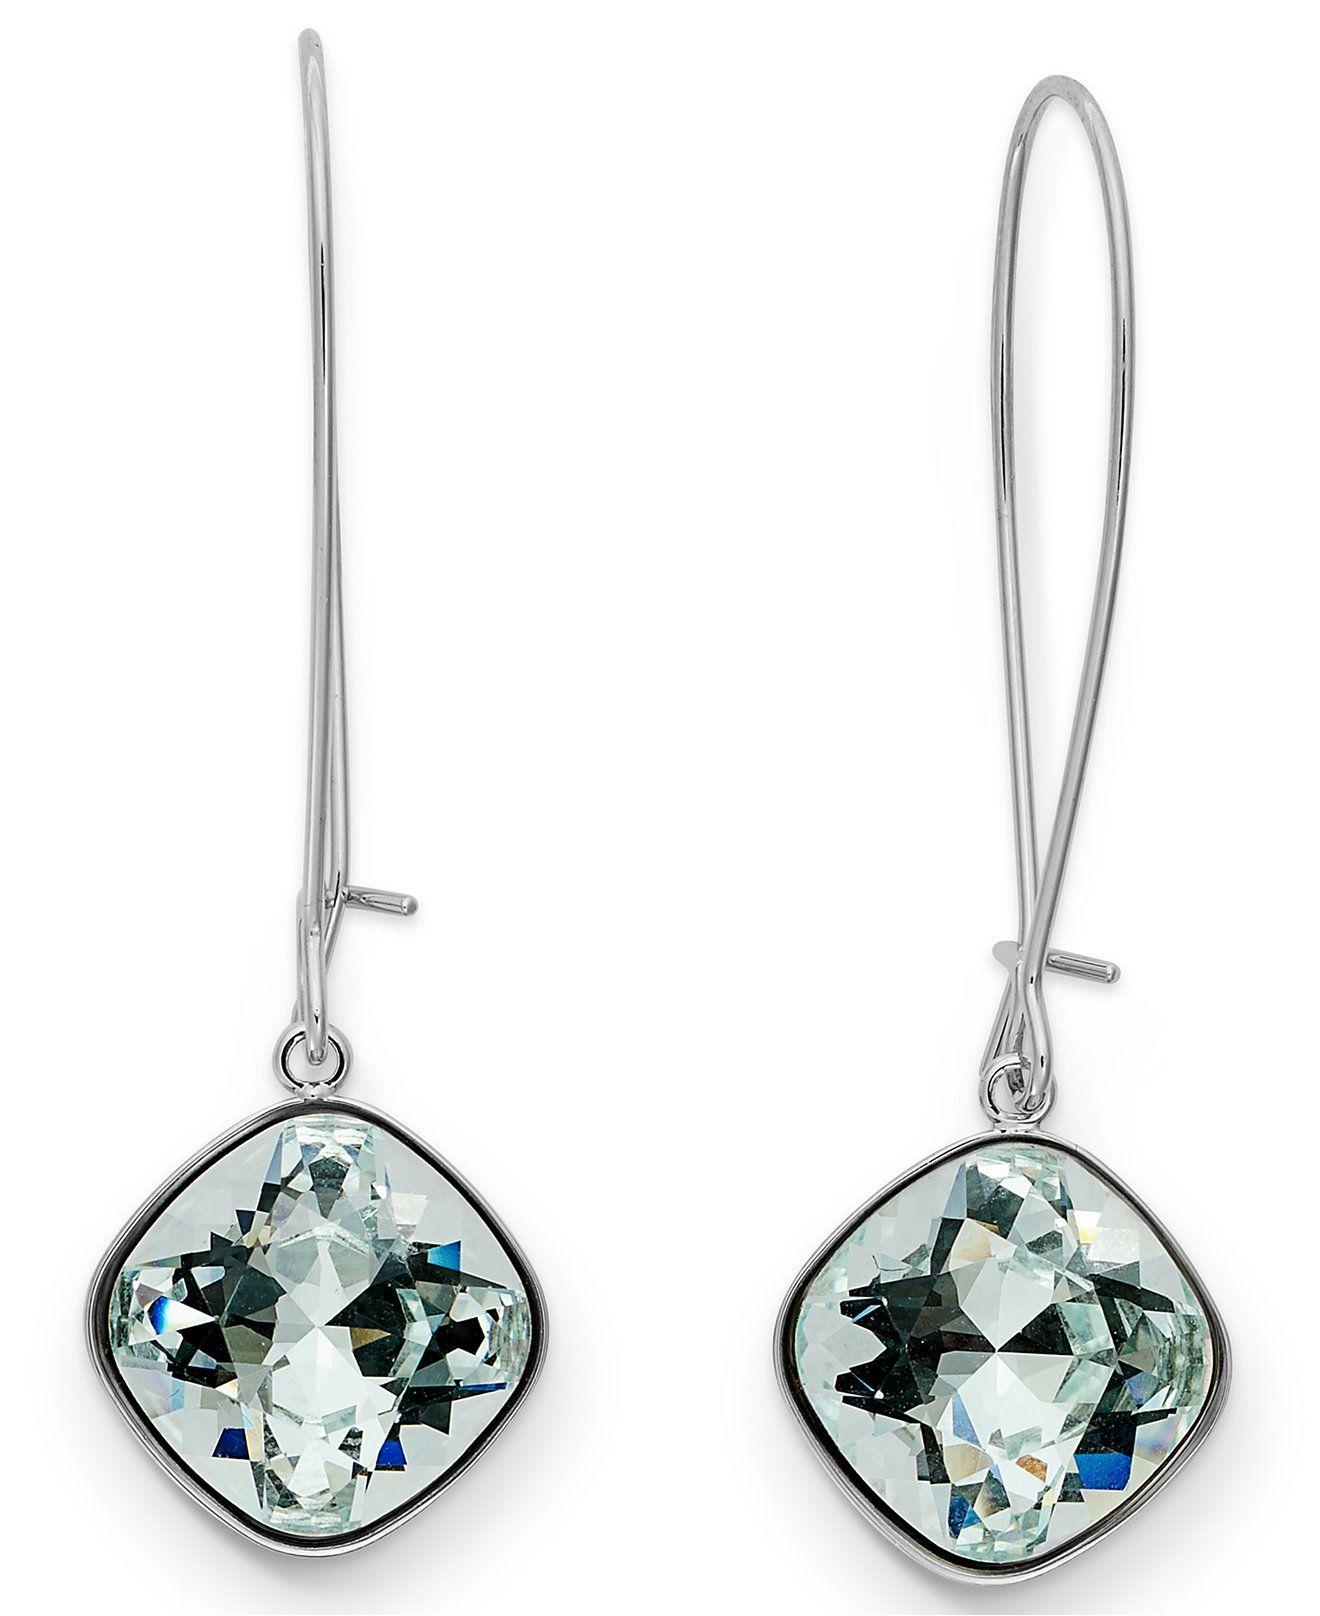 9e8984958 Swarovski Earrings, Rhodium-Plated Cushion Cut Light Azore Crystal Drop  Earrings - Jewelry & Watches - Macy's